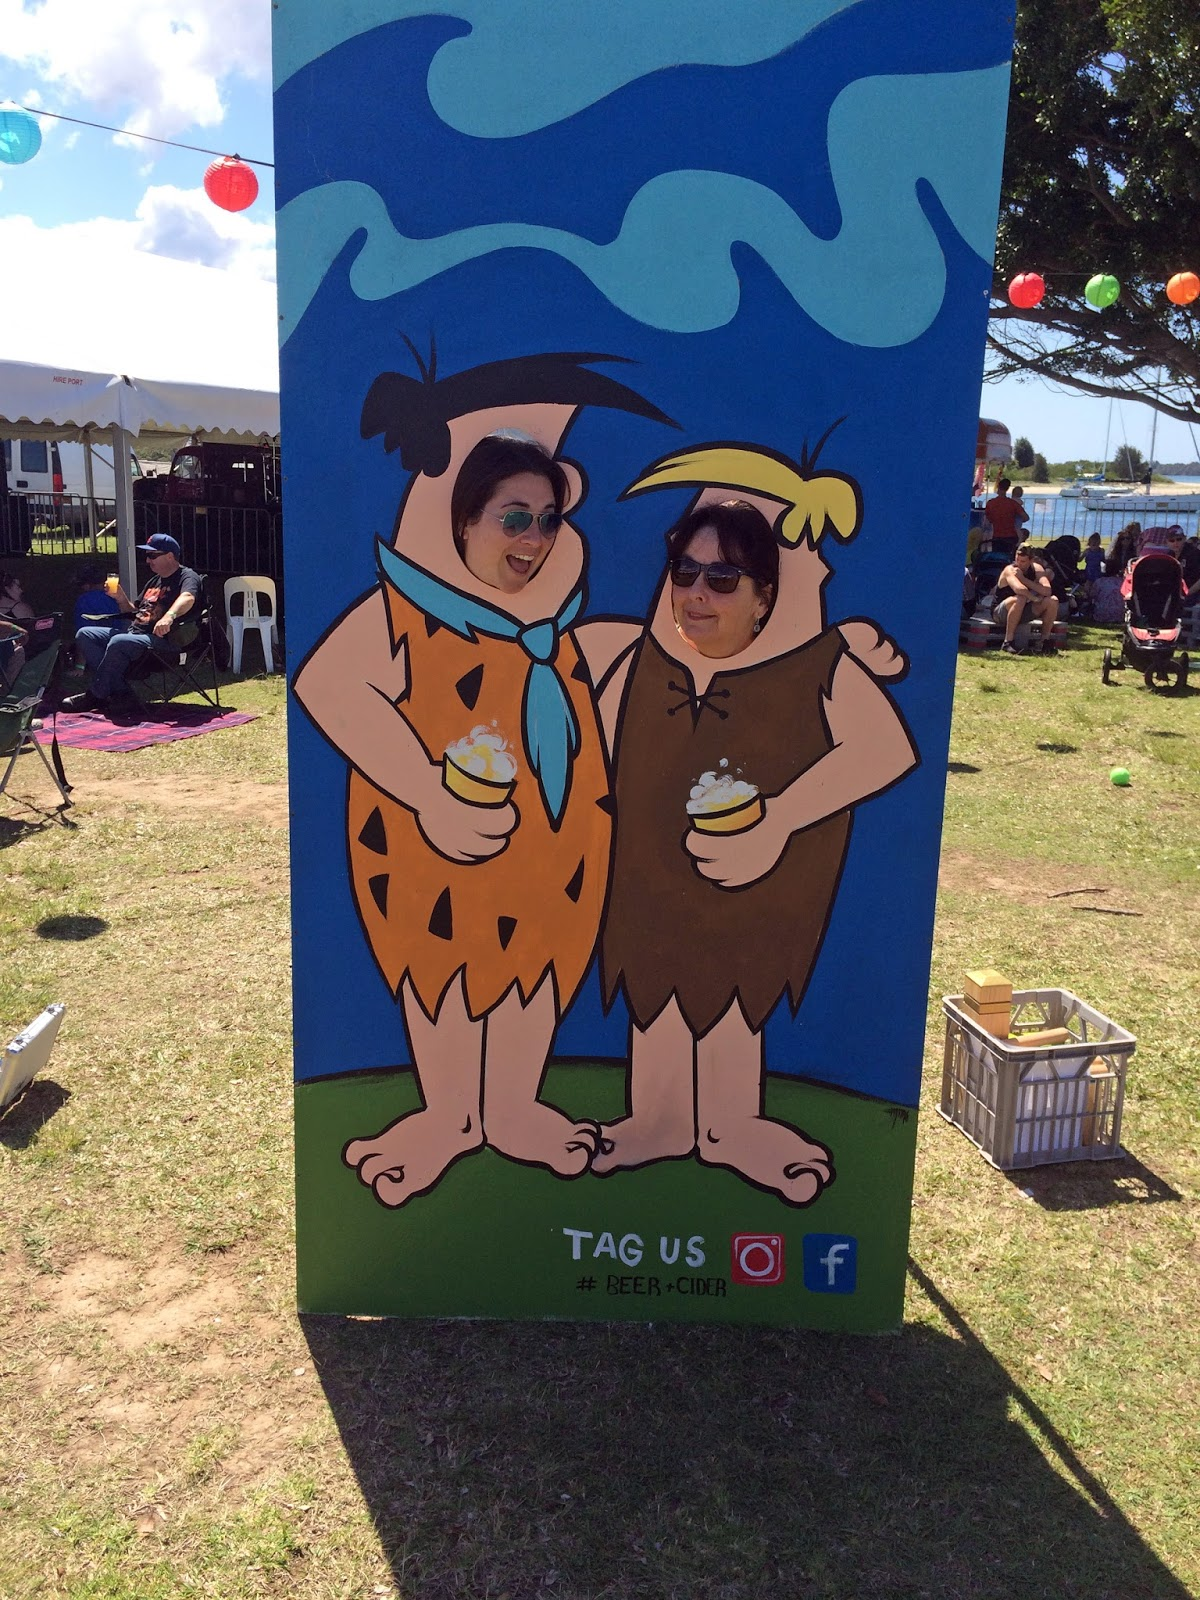 Port Macquarie Beer and Cider Festival Cutouts Fun